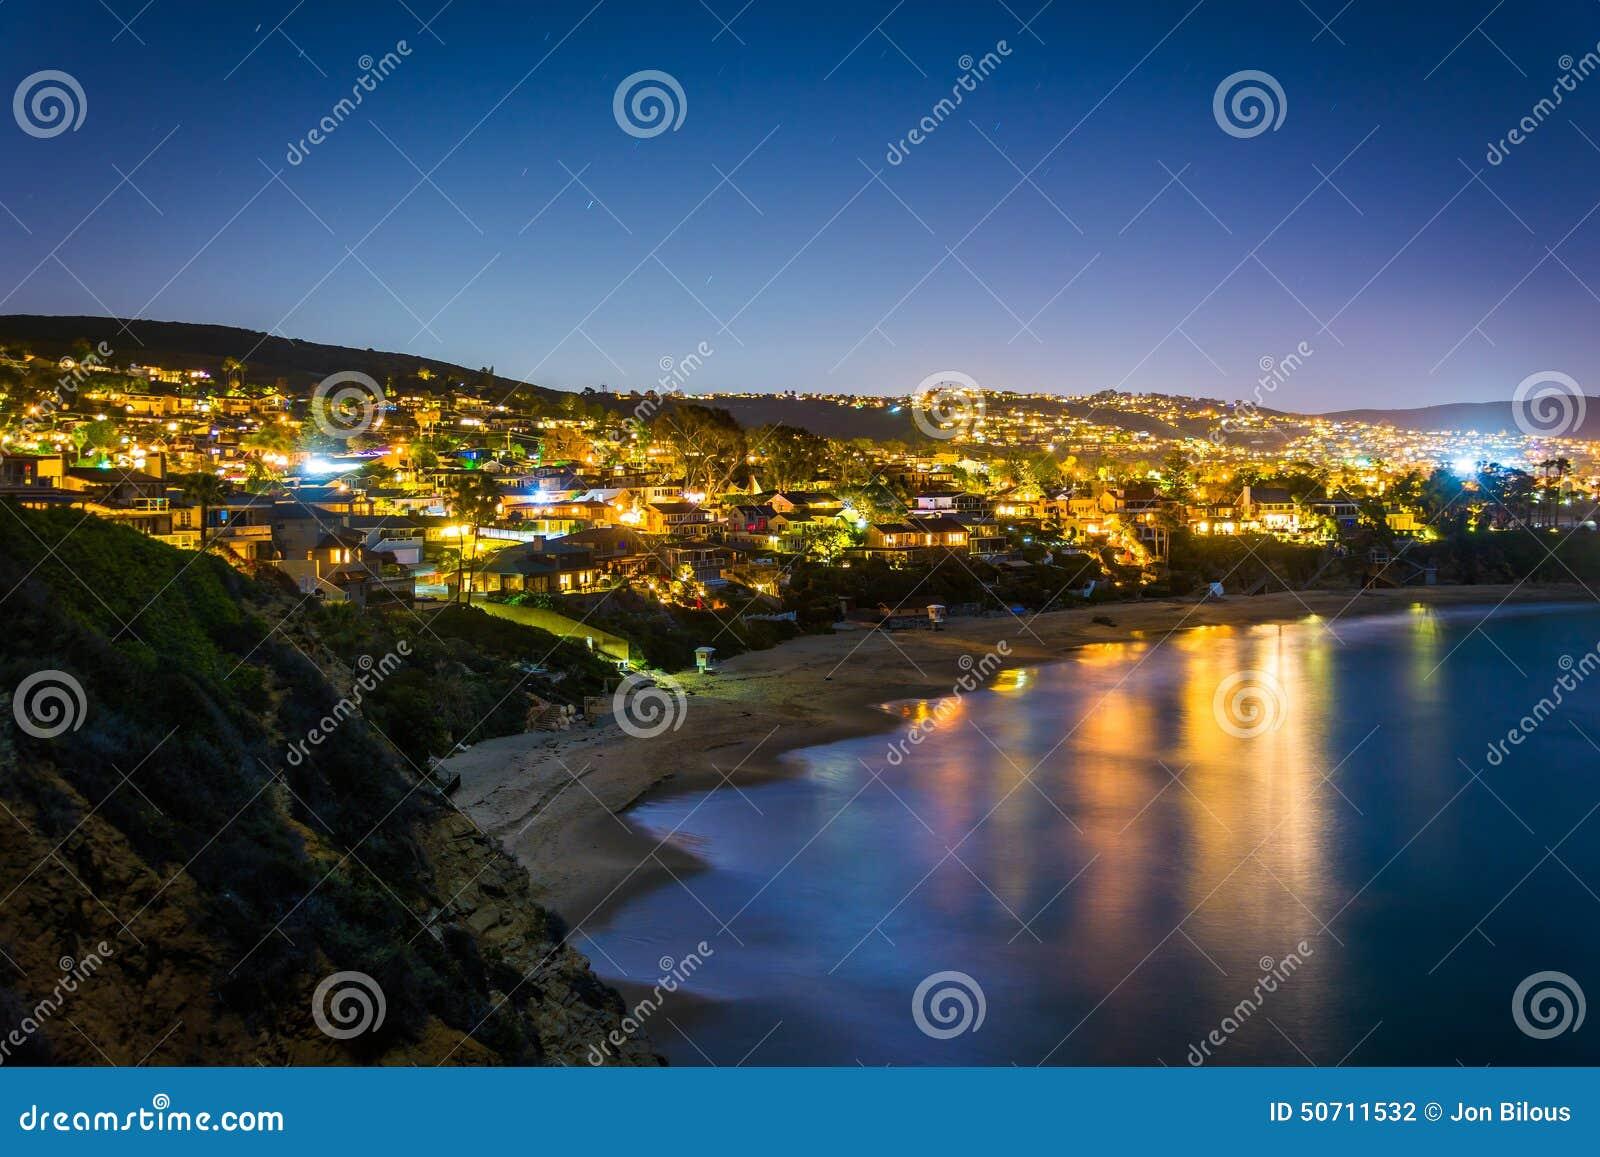 Ocean View Hotel Crescent City